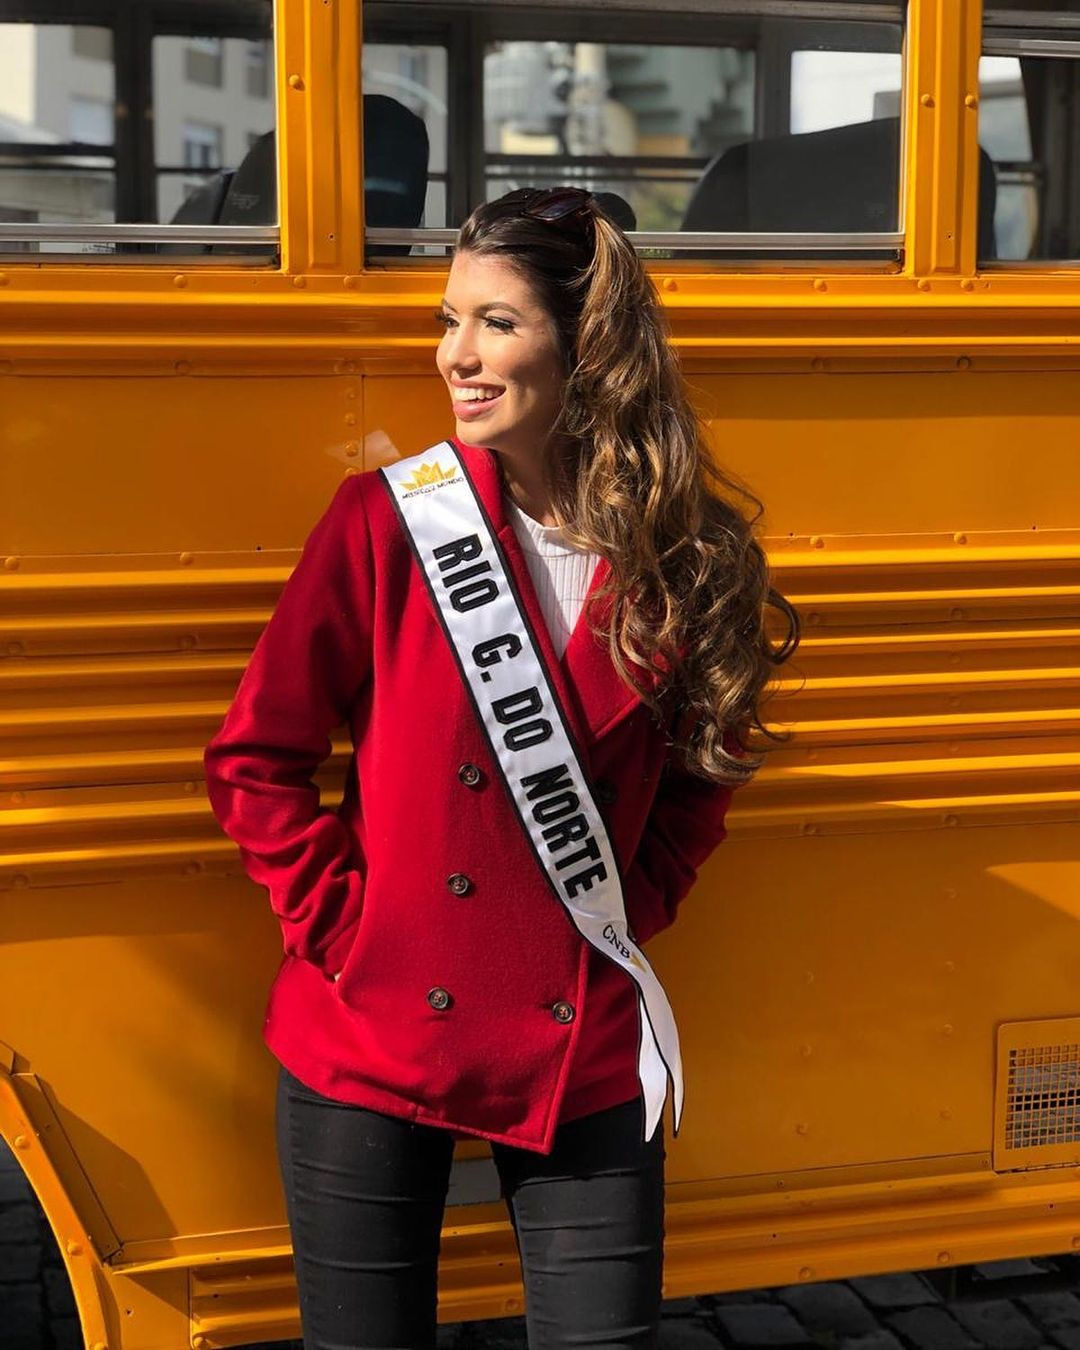 marcelle bezerra, top 20 de miss brasil mundo 2019. - Página 4 21299616